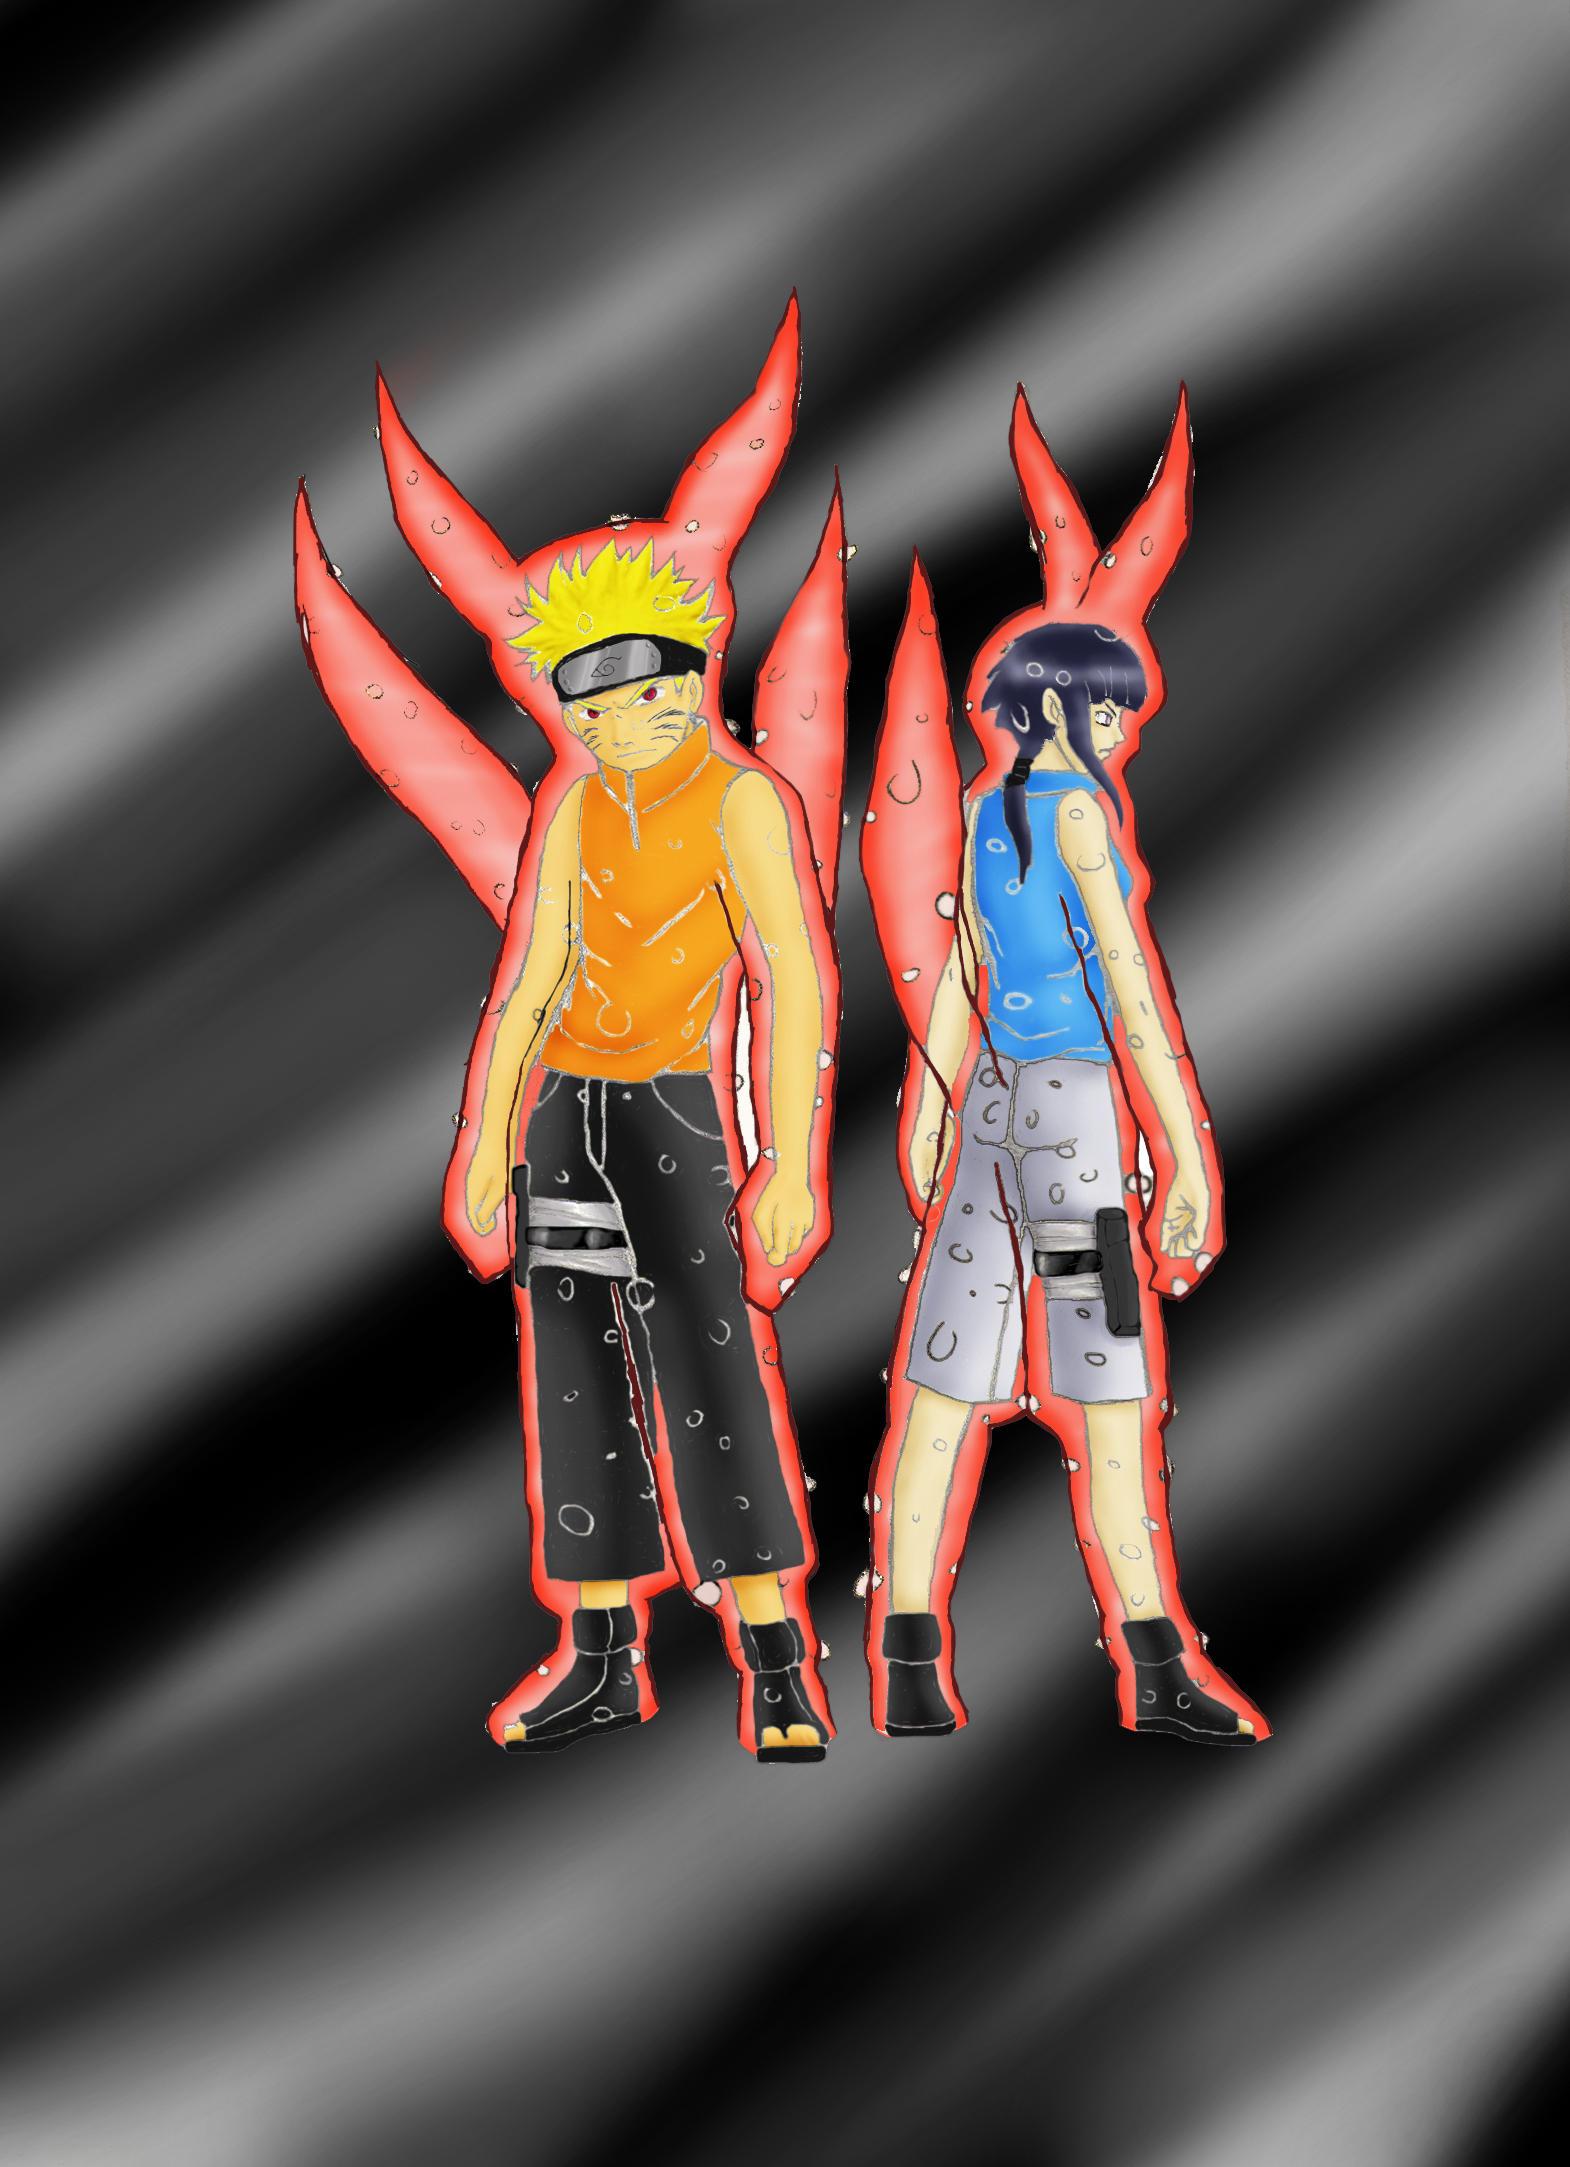 Kyuubi Naruto and Hinata by Shadiz on DeviantArt Naruto X Fem Kyuubi Romance Fanfiction